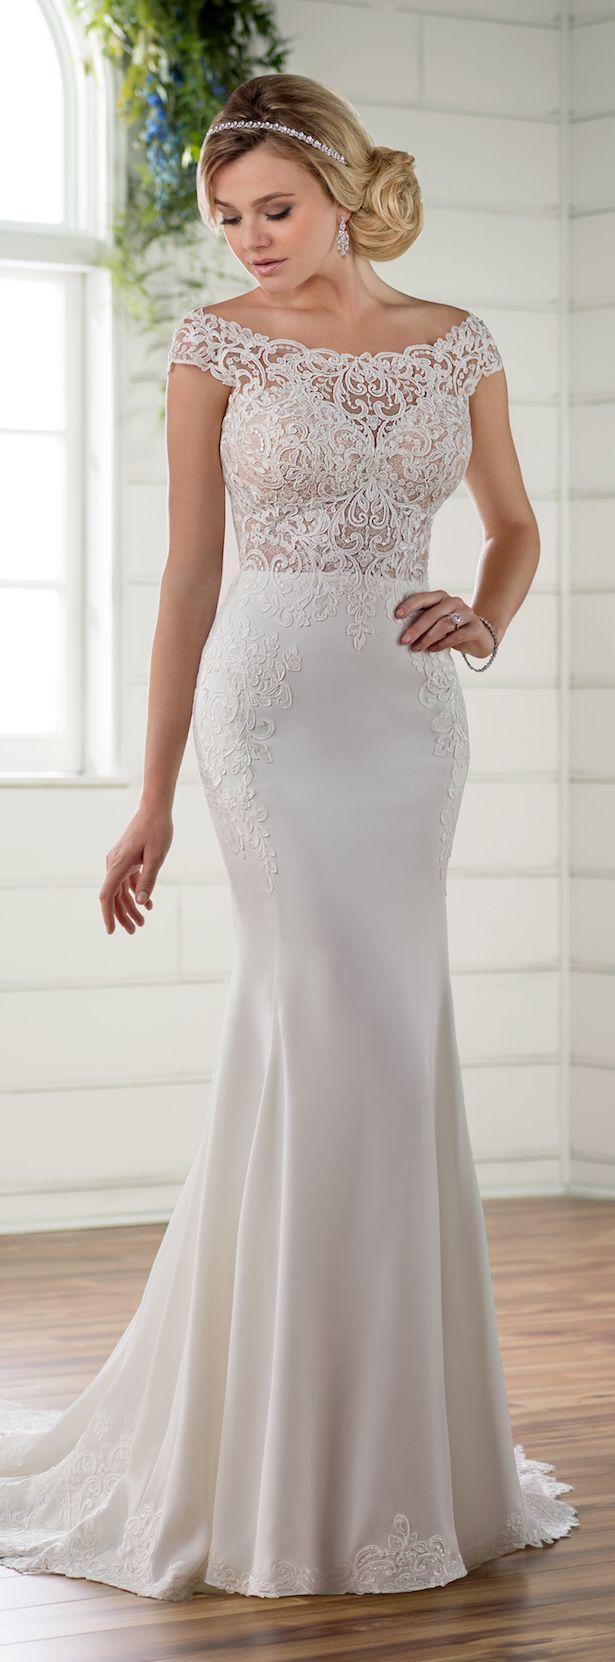 Essense wedding dress  Essense of Australia Spring  Bridal Collection  Bridal